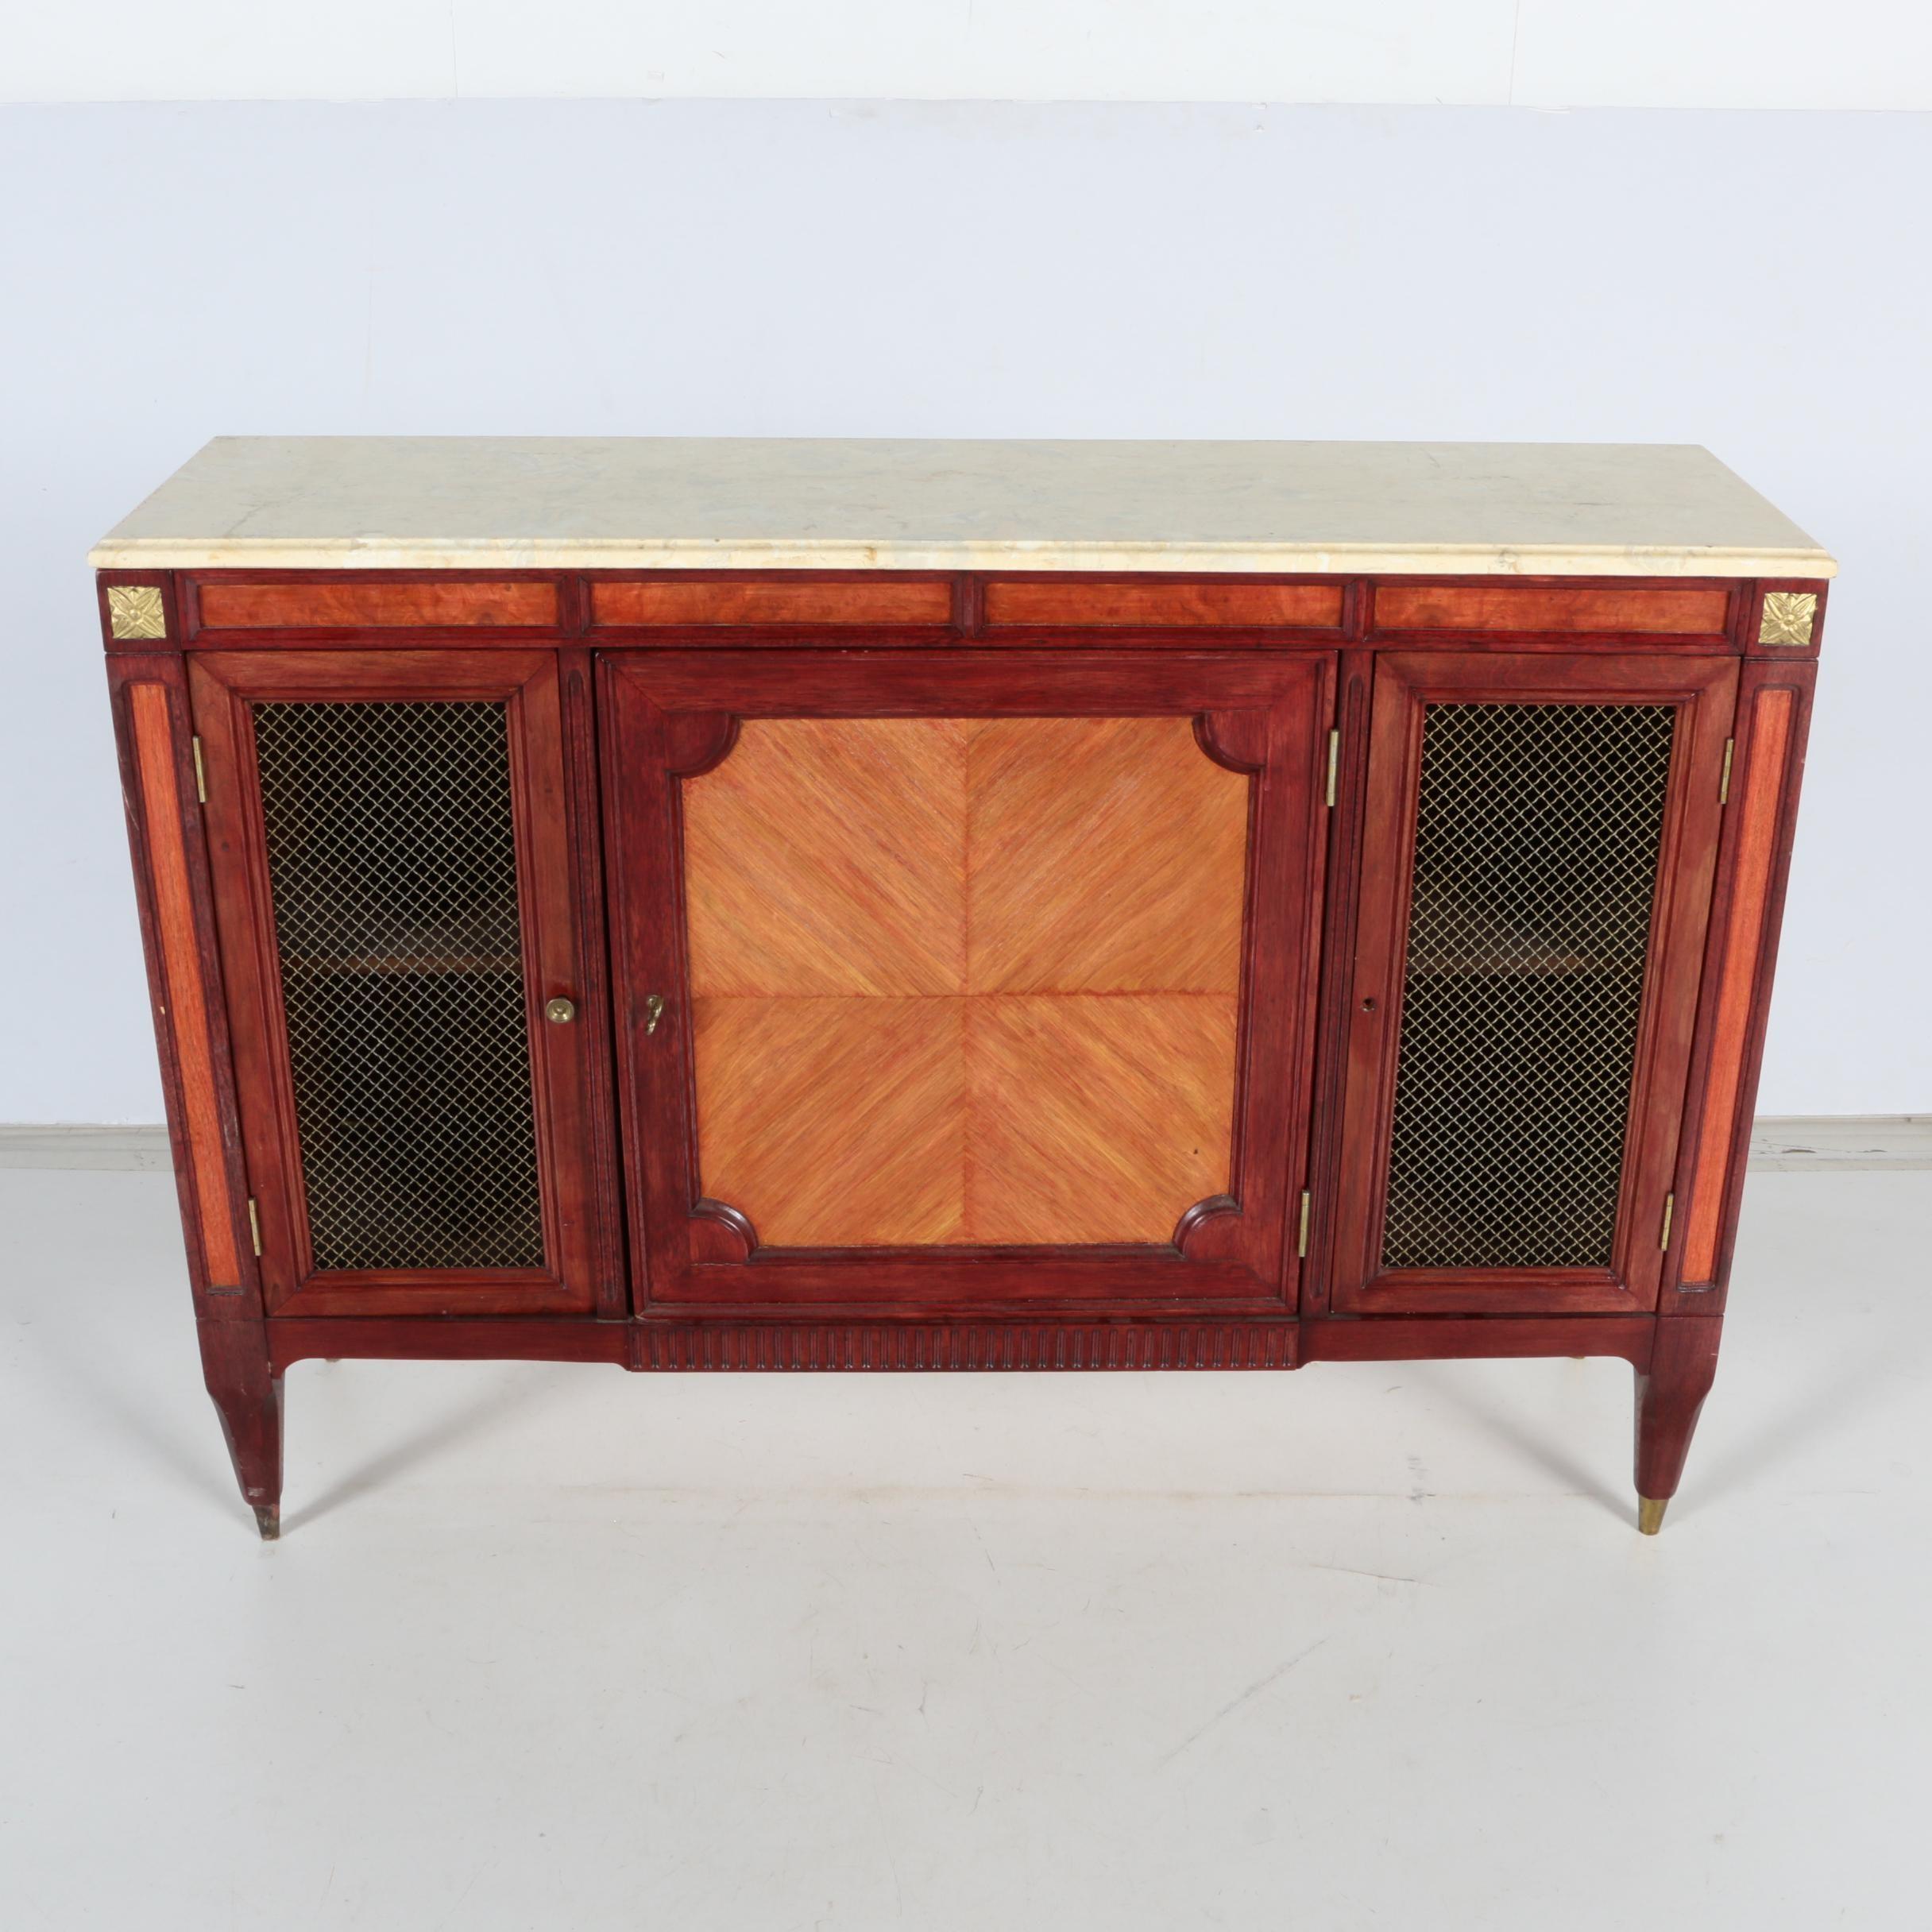 Marble Top Cabinet by J. B. Van Sciver